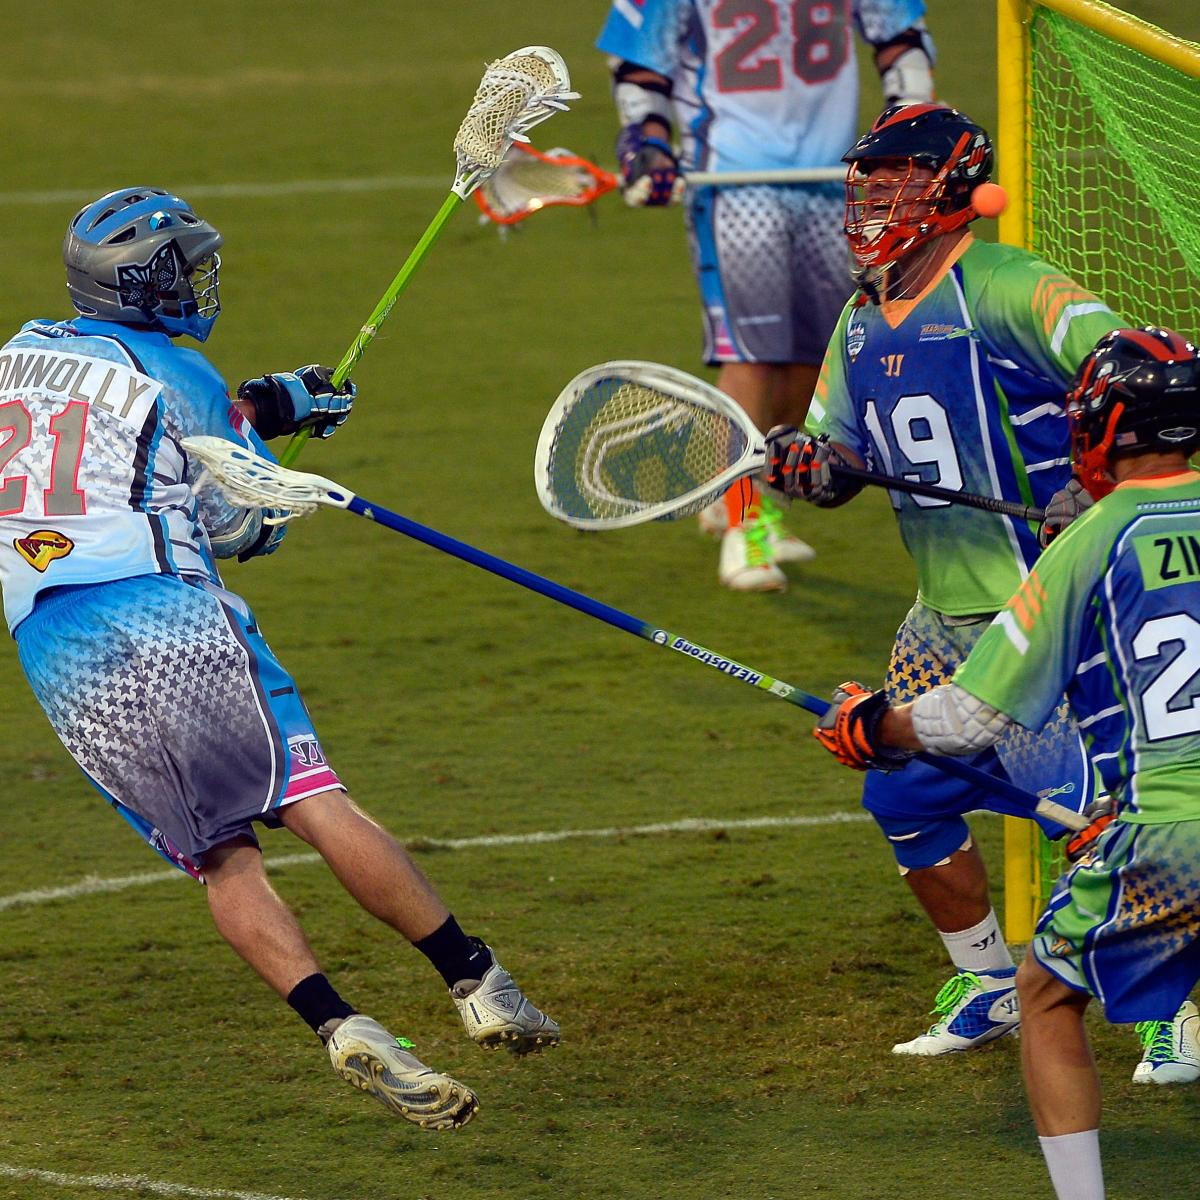 2012 Major League Lacrosse All-Star Weekend Full Analysis ...